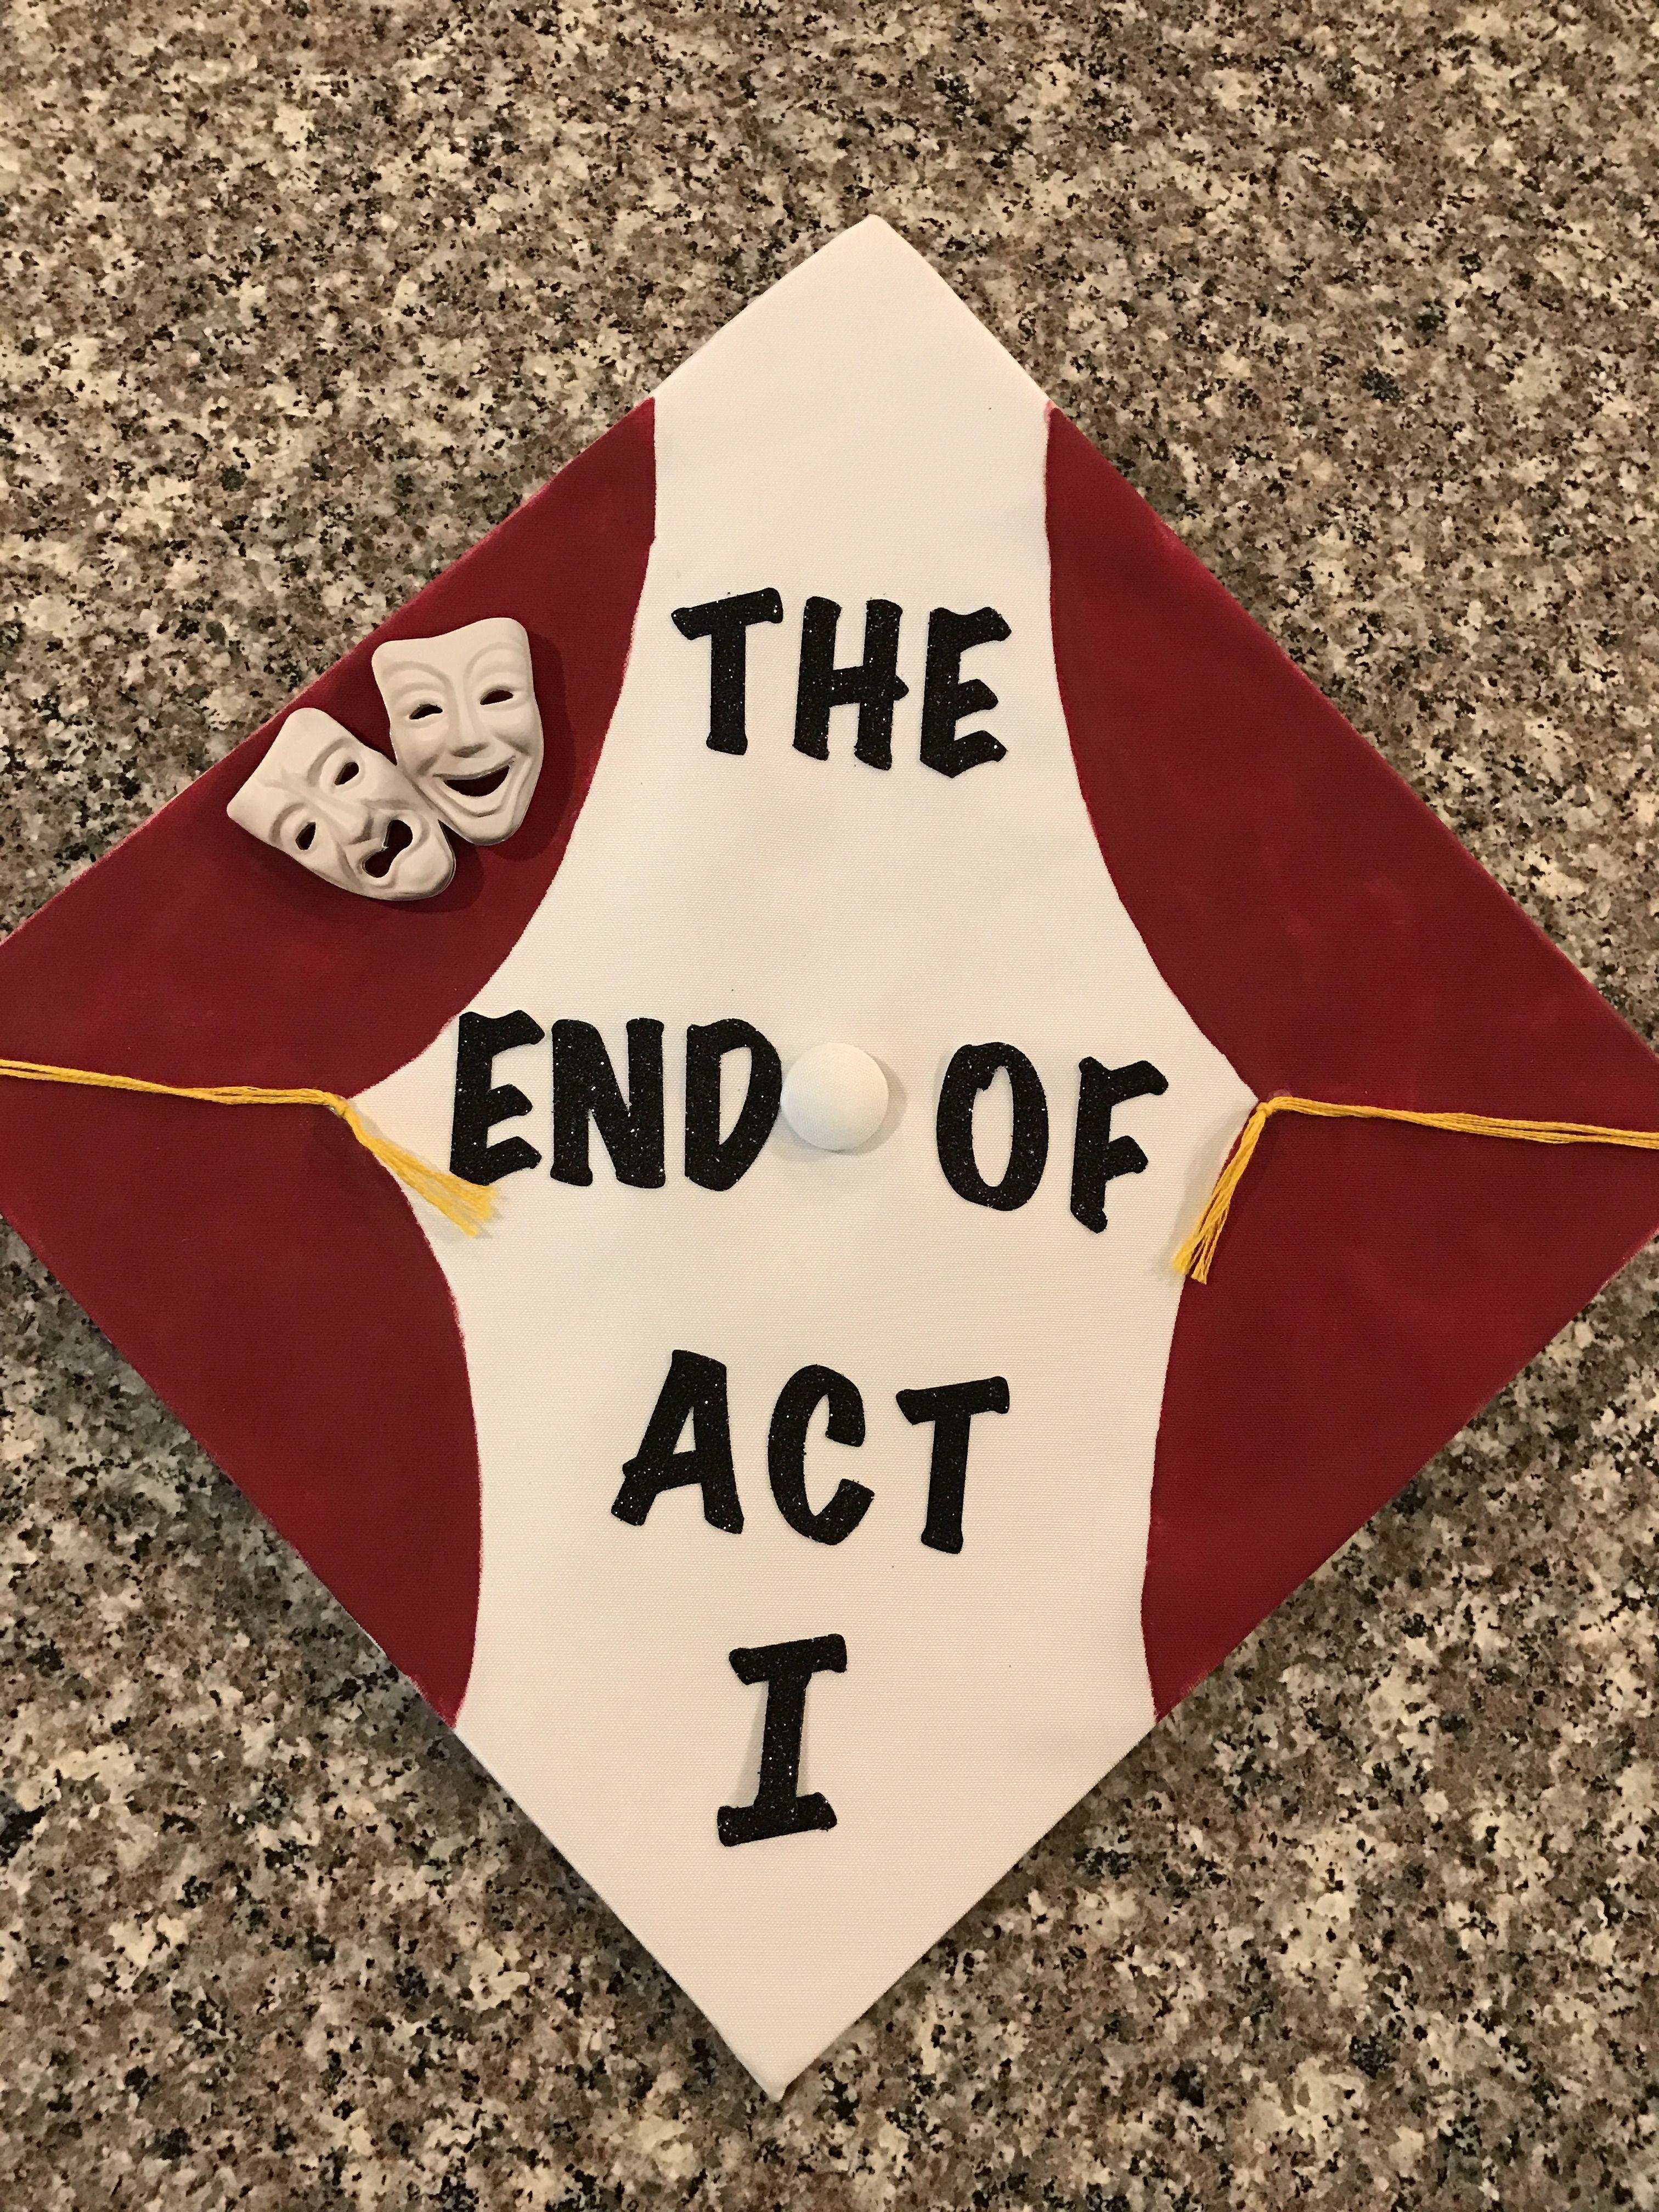 Theatre graduation cap The end of act